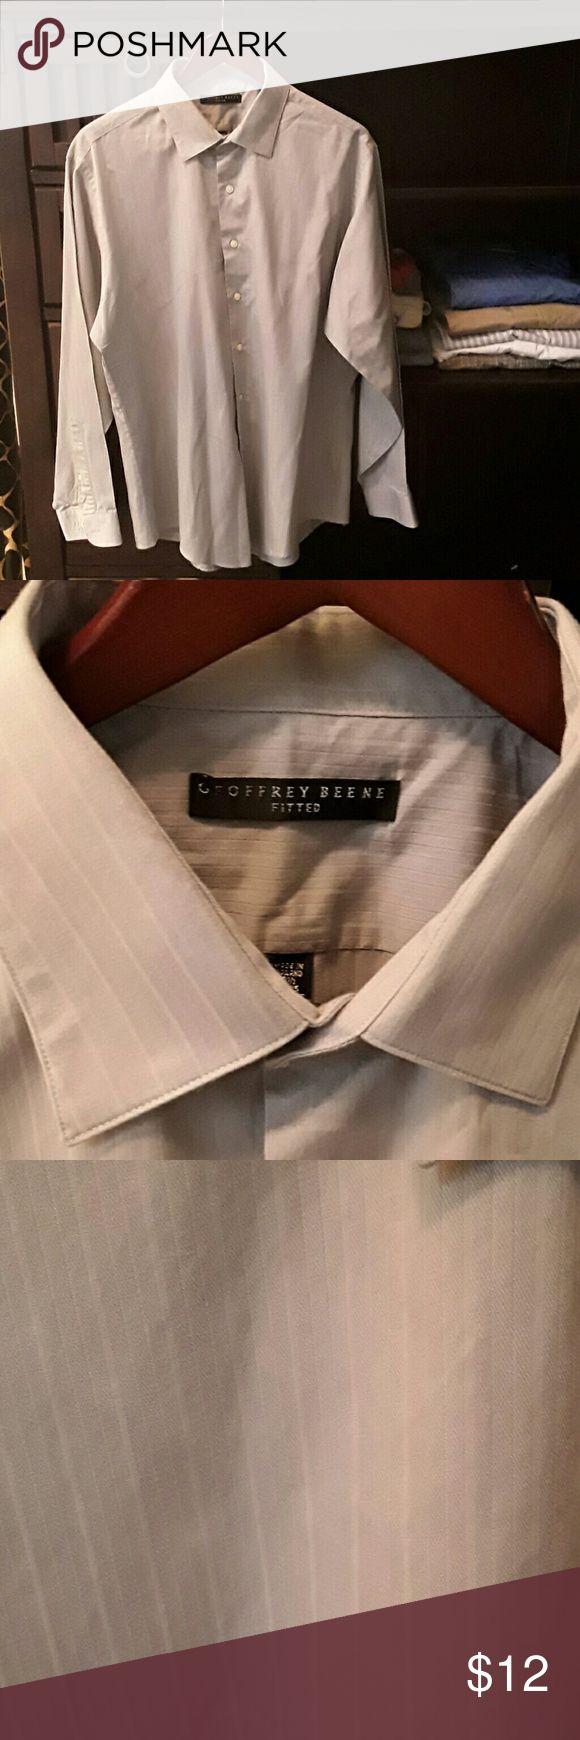 Men's shirt Geoffrey Beene Grey, very elegant. New condition. No flaws. 17 1/2 x 34/5. Wrinkle free. Geoffrey Beene Shirts Dress Shirts